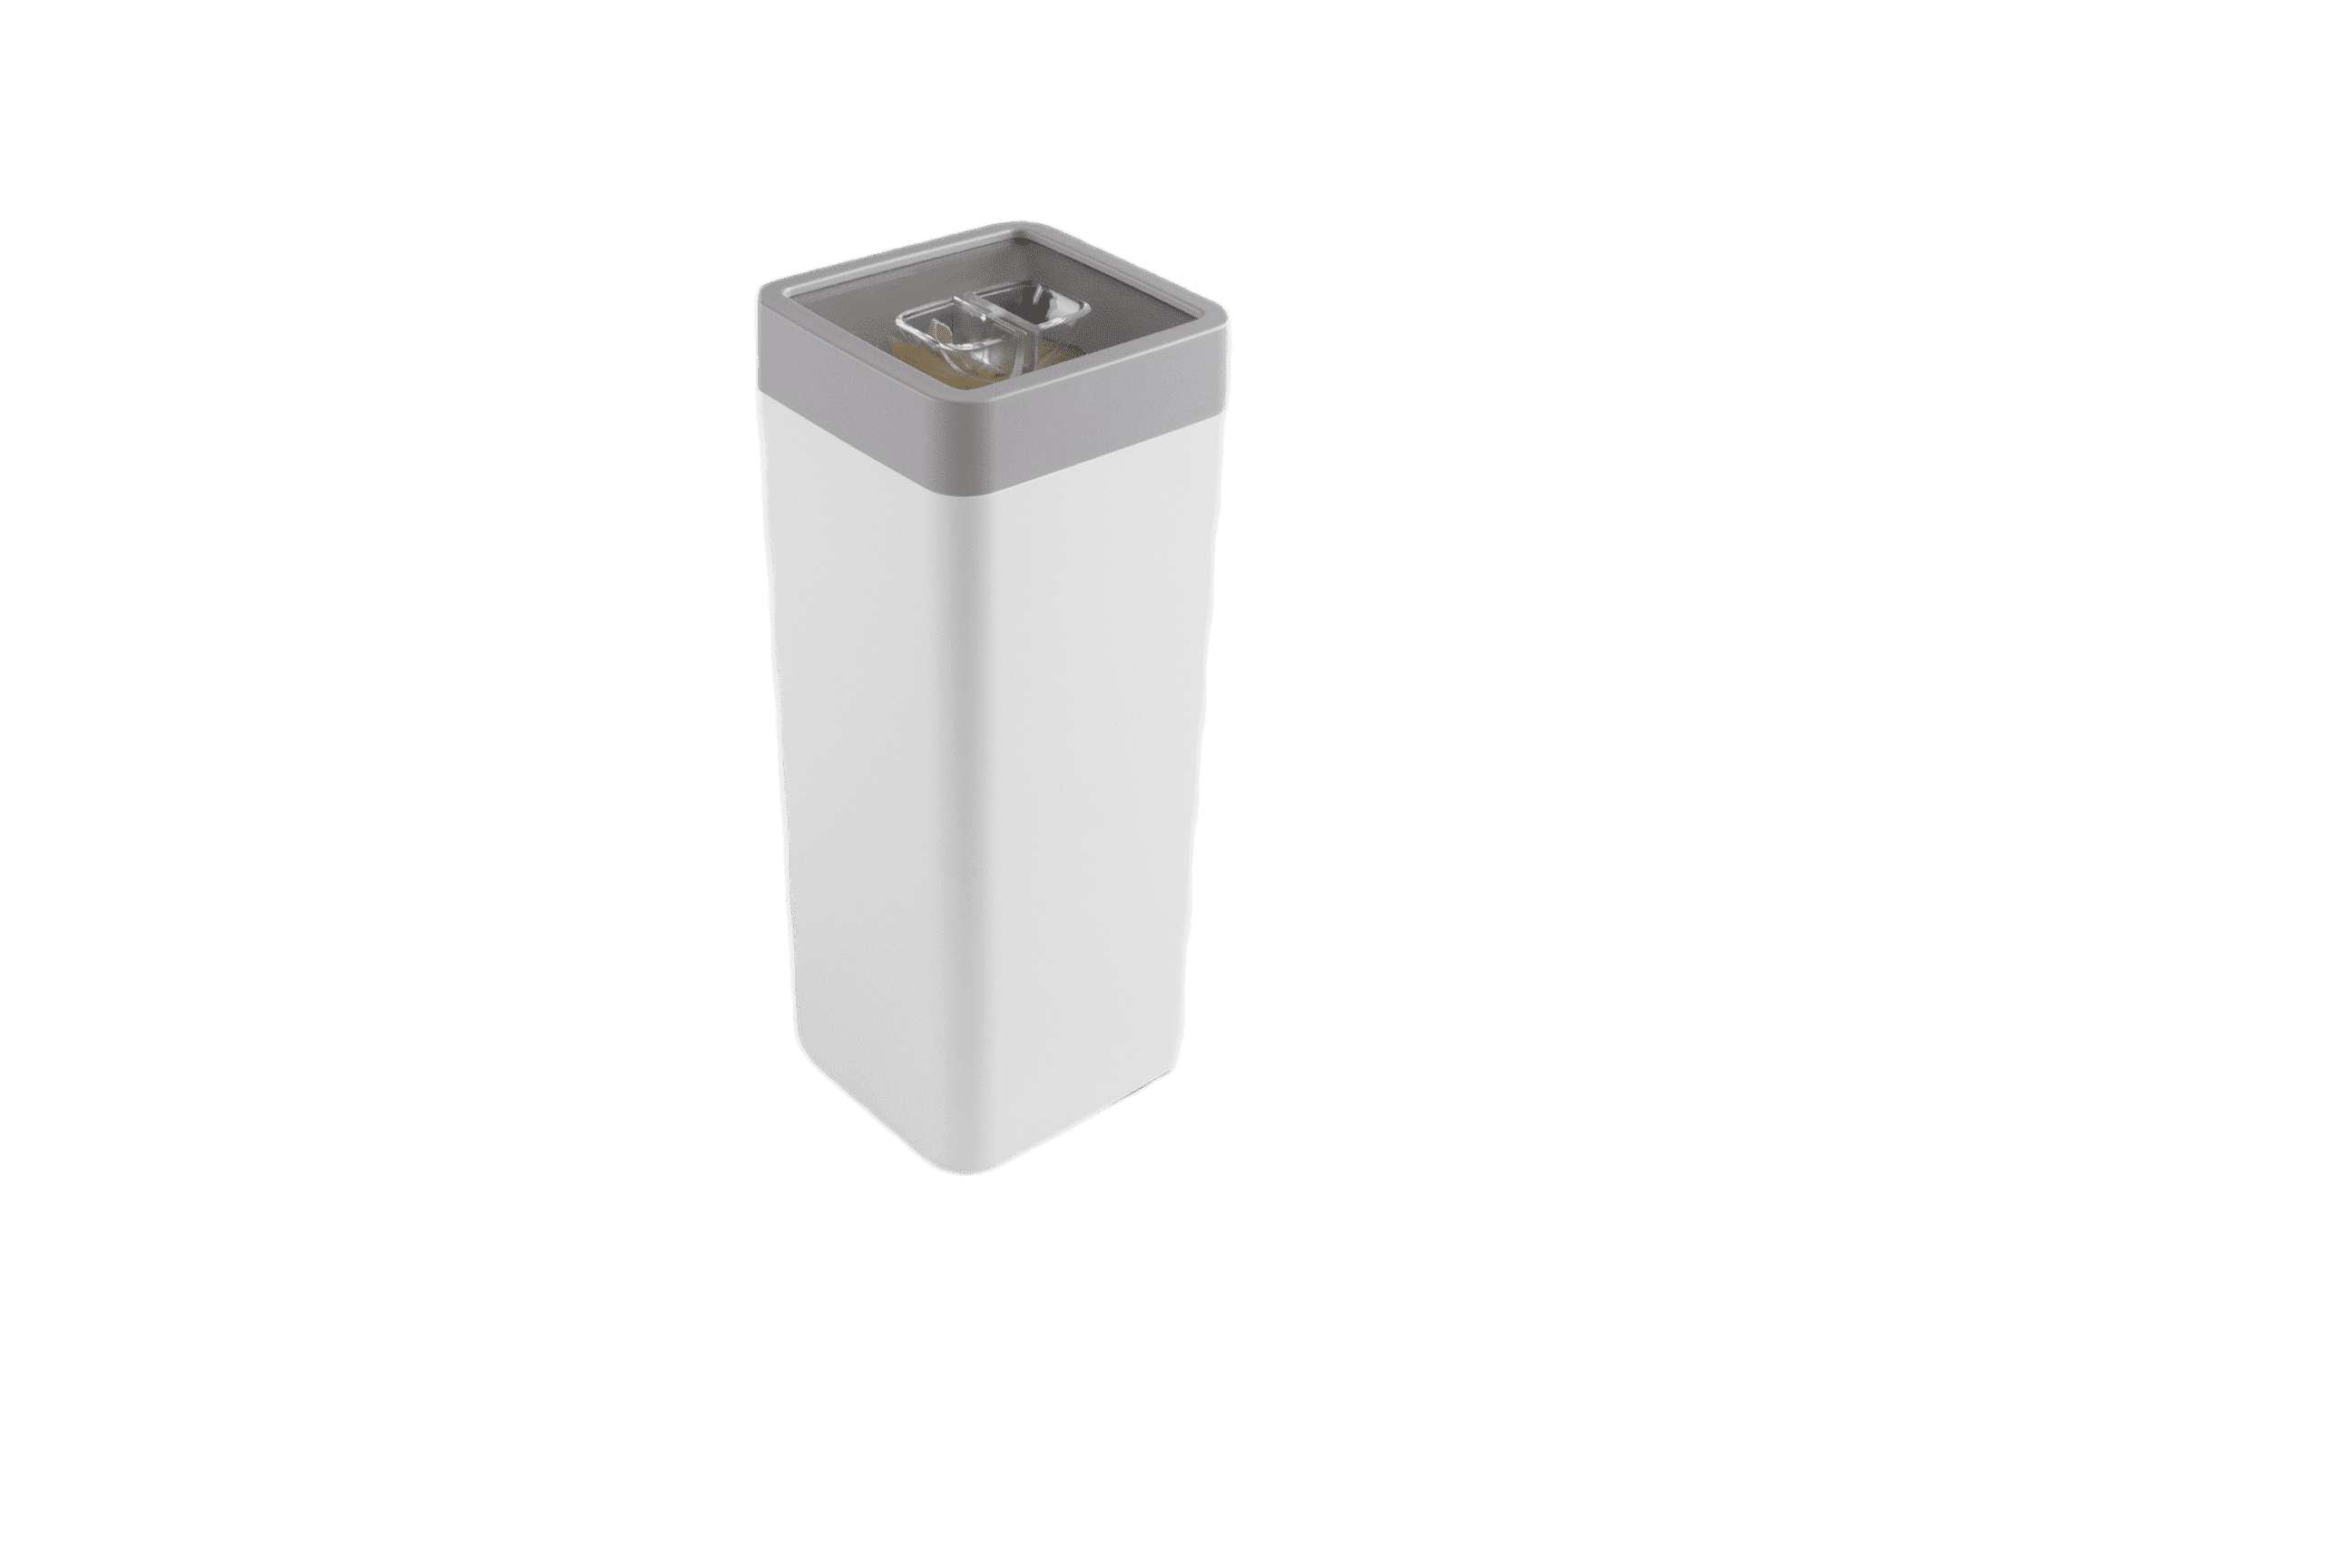 Sigma home voorraadbus 1,4l